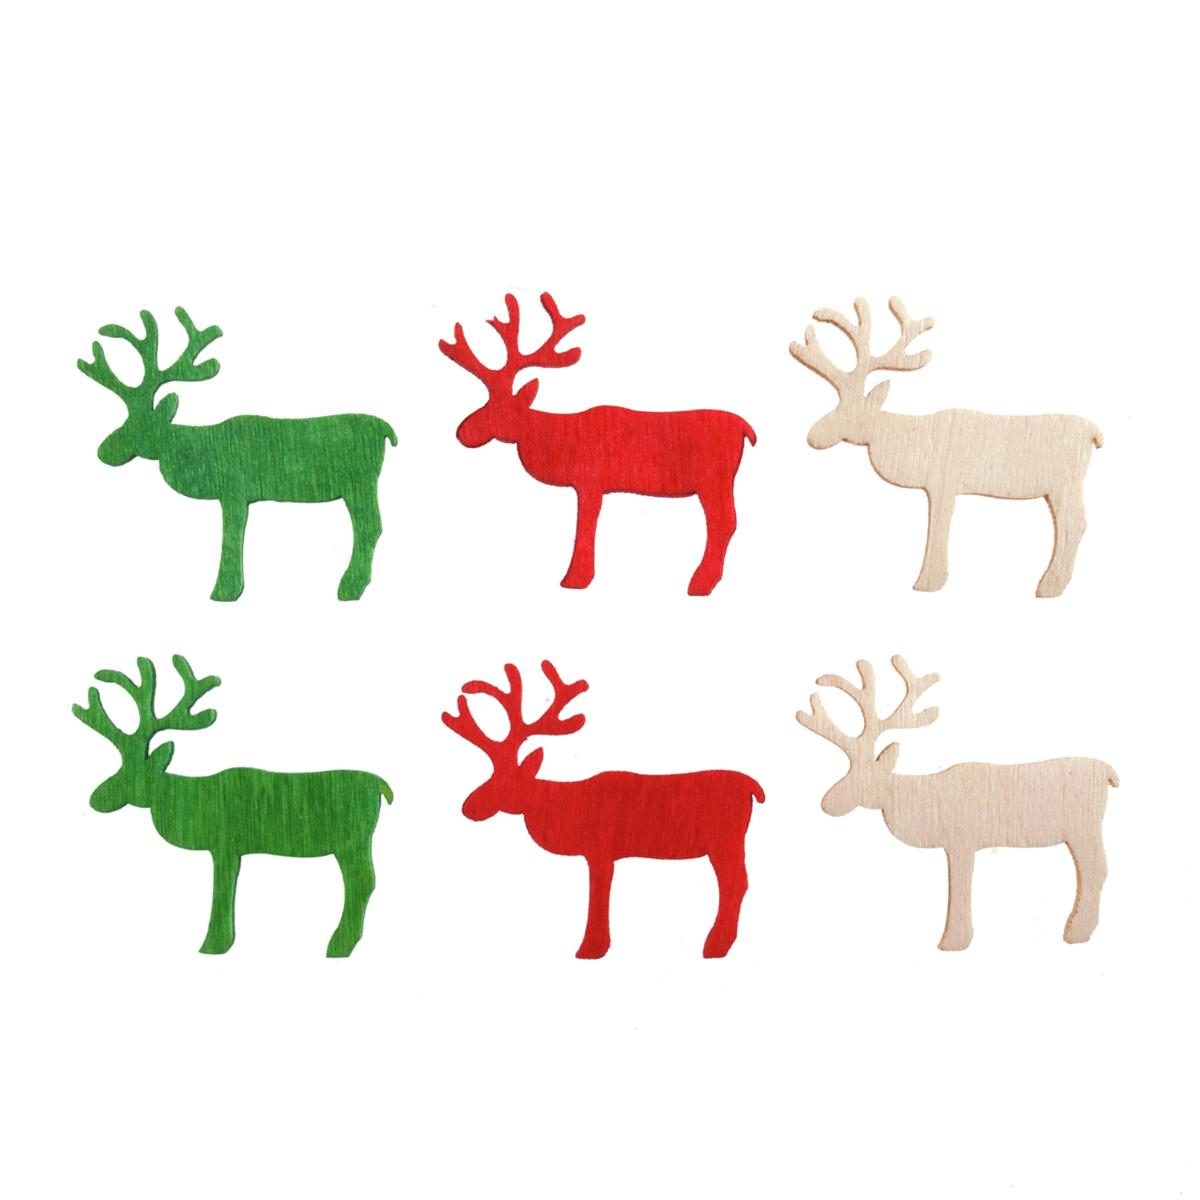 12 x Christmas Bright Wooden Reindeer Embellishments Scrap booking